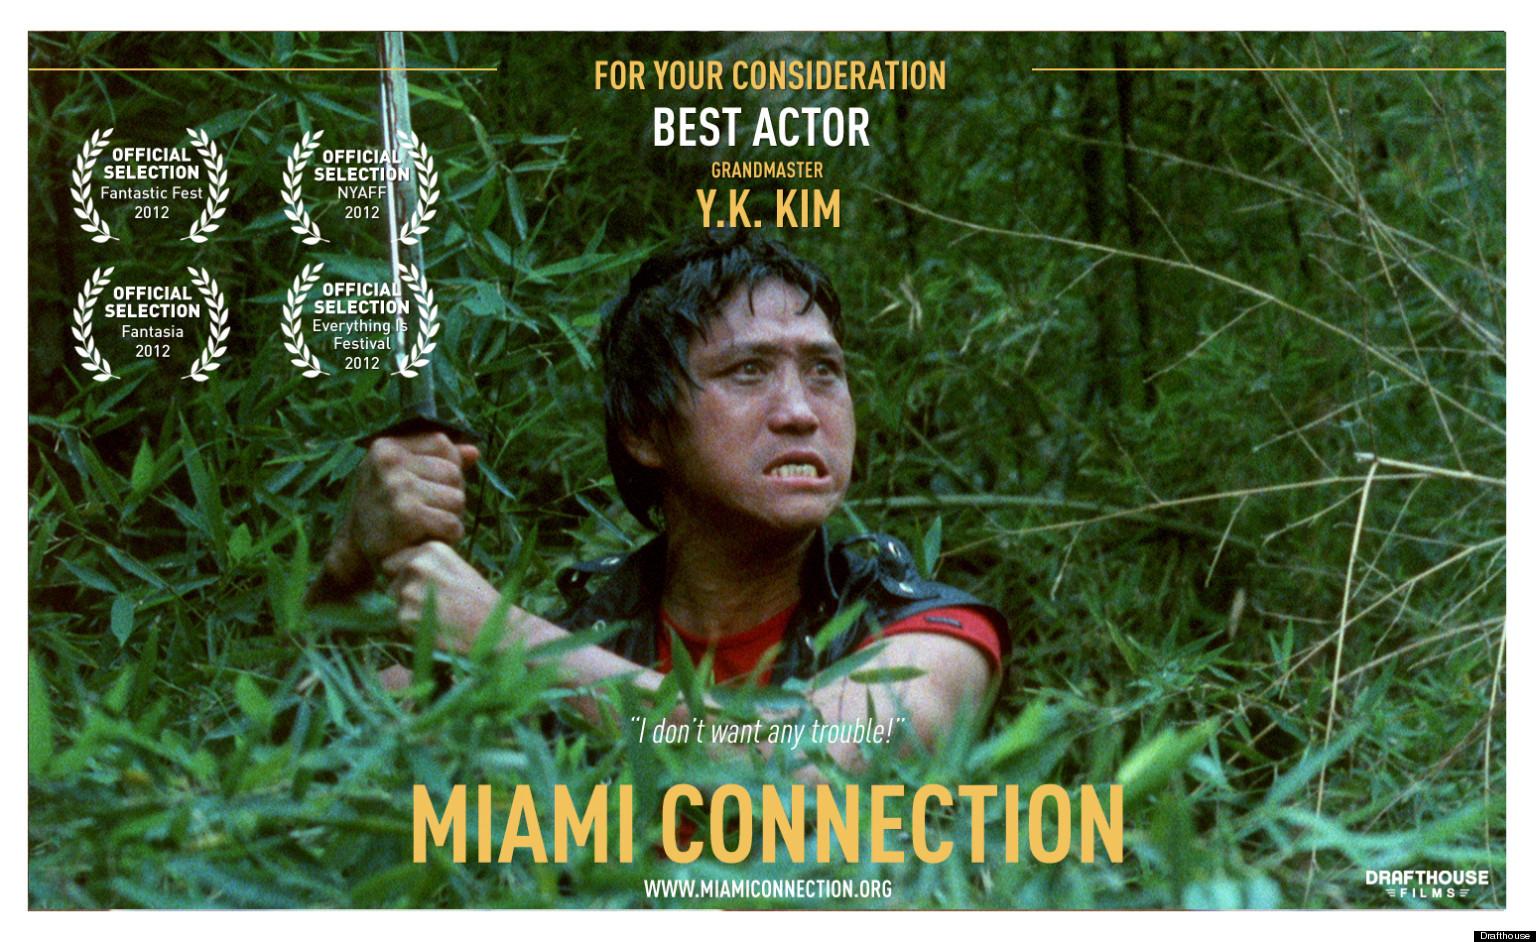 Miami Connection Grandmaster Y K Kim For Best Actor